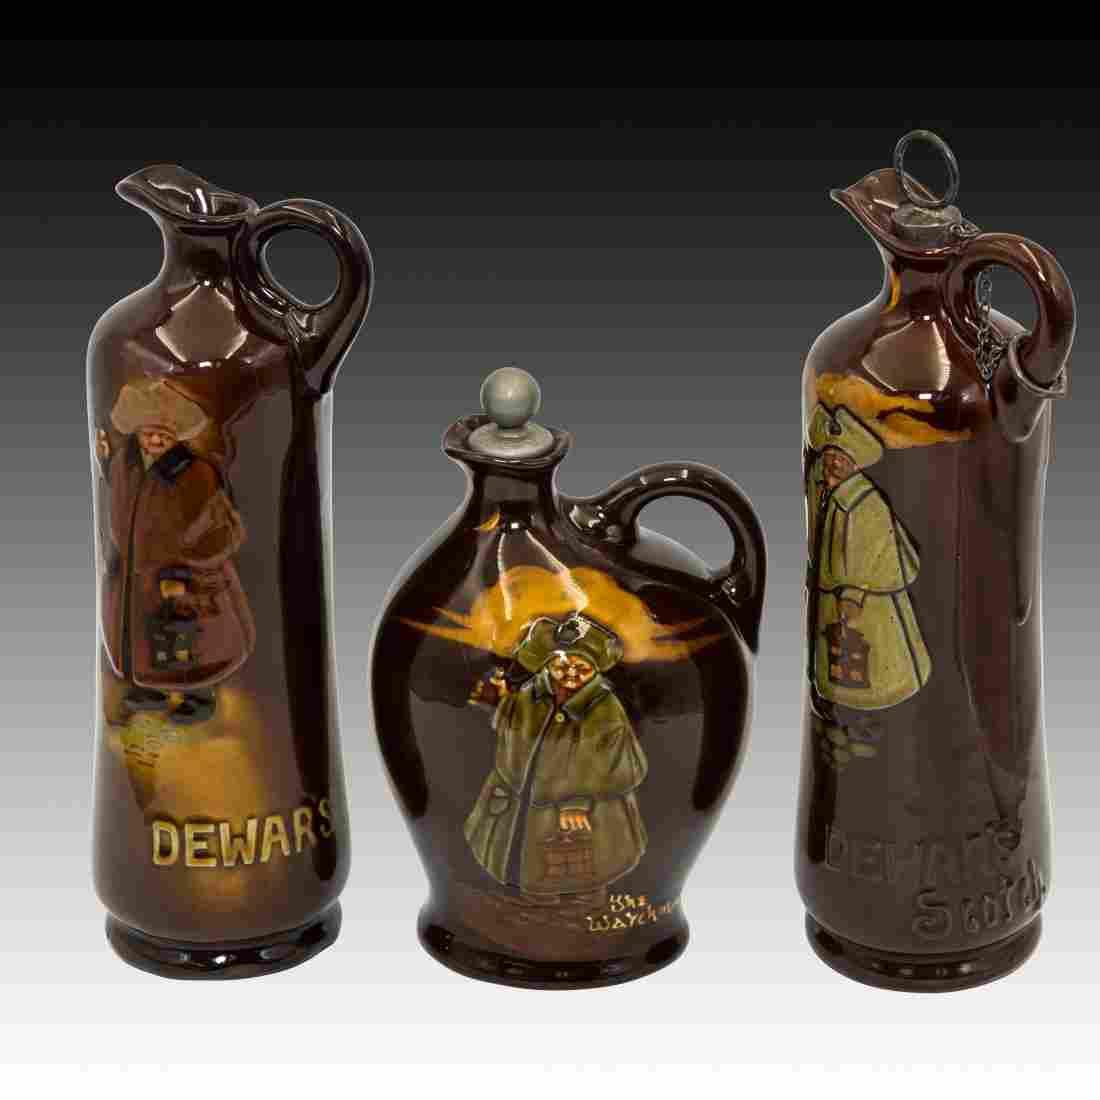 3 Royal Doulton Dewar's Kingsware Whiskey Flasks